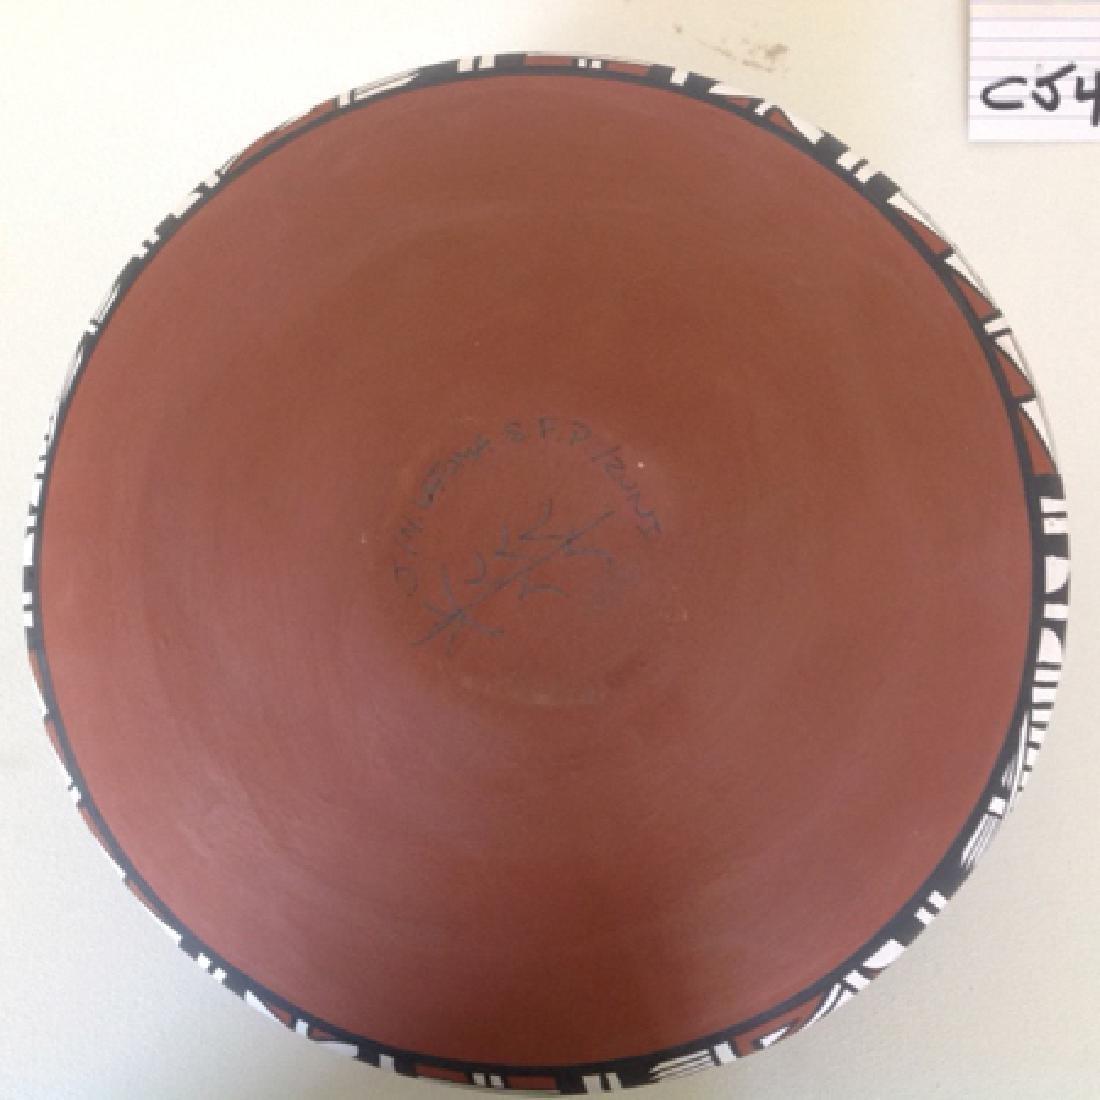 San Felipe/Zuni Pottery Vessel - J & N Latoma - 2